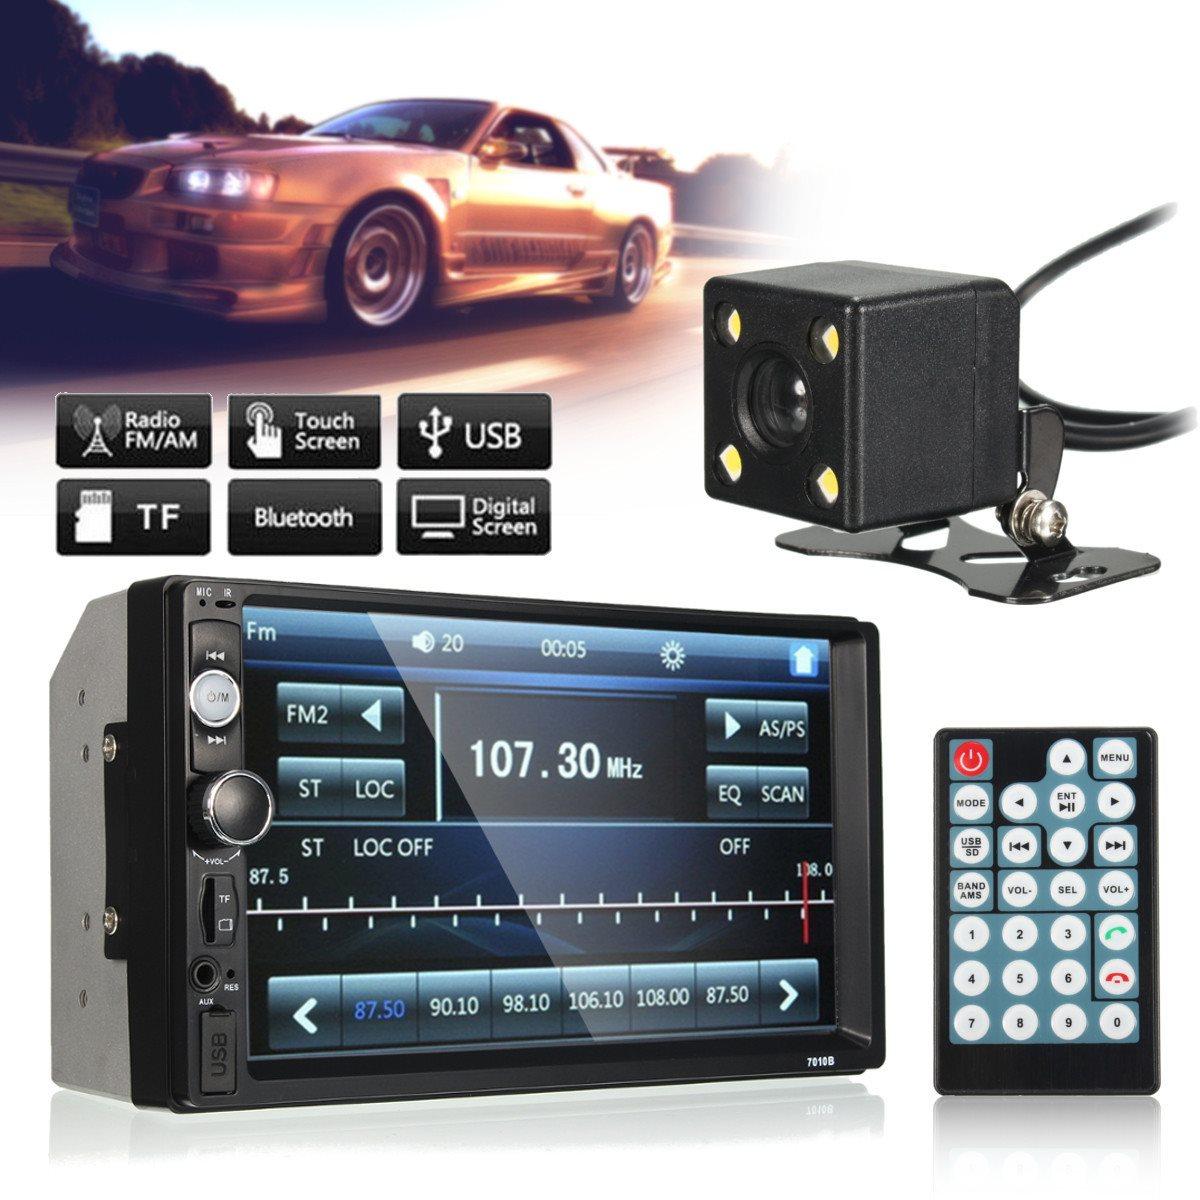 ФОТО 7 Inch Car Auto Audio Stereo Radio MP5 MP3 Player FM USB AUX Full HD Bluetooth Touch Screen 120 Dergree Rear View Camera